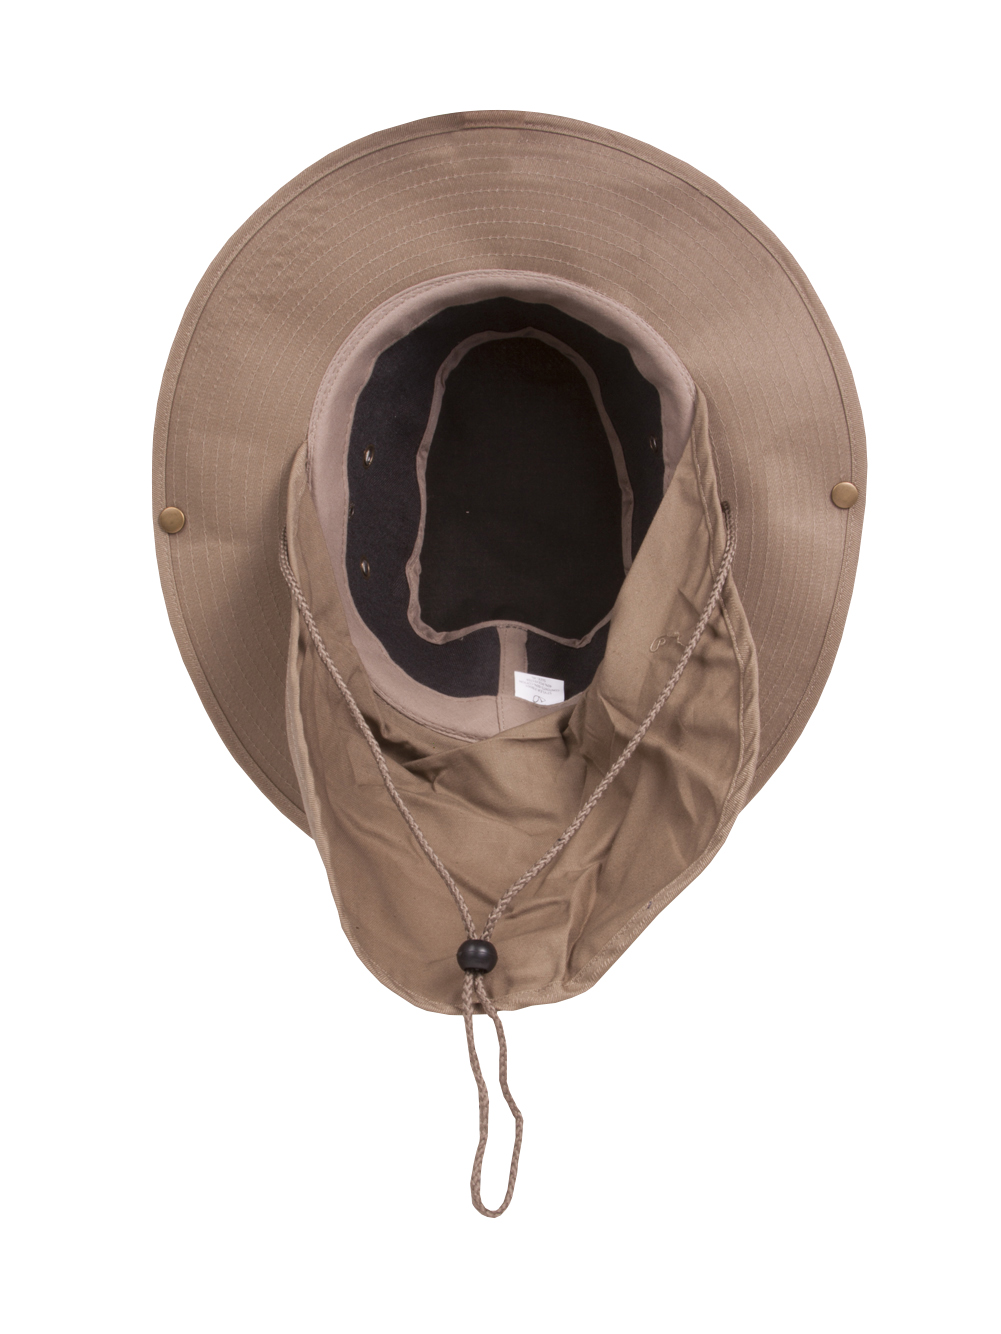 fb989a9272e Top Headwear Safari Explorer Bucket Hat With Flap Neck Cover - Khaki - Small